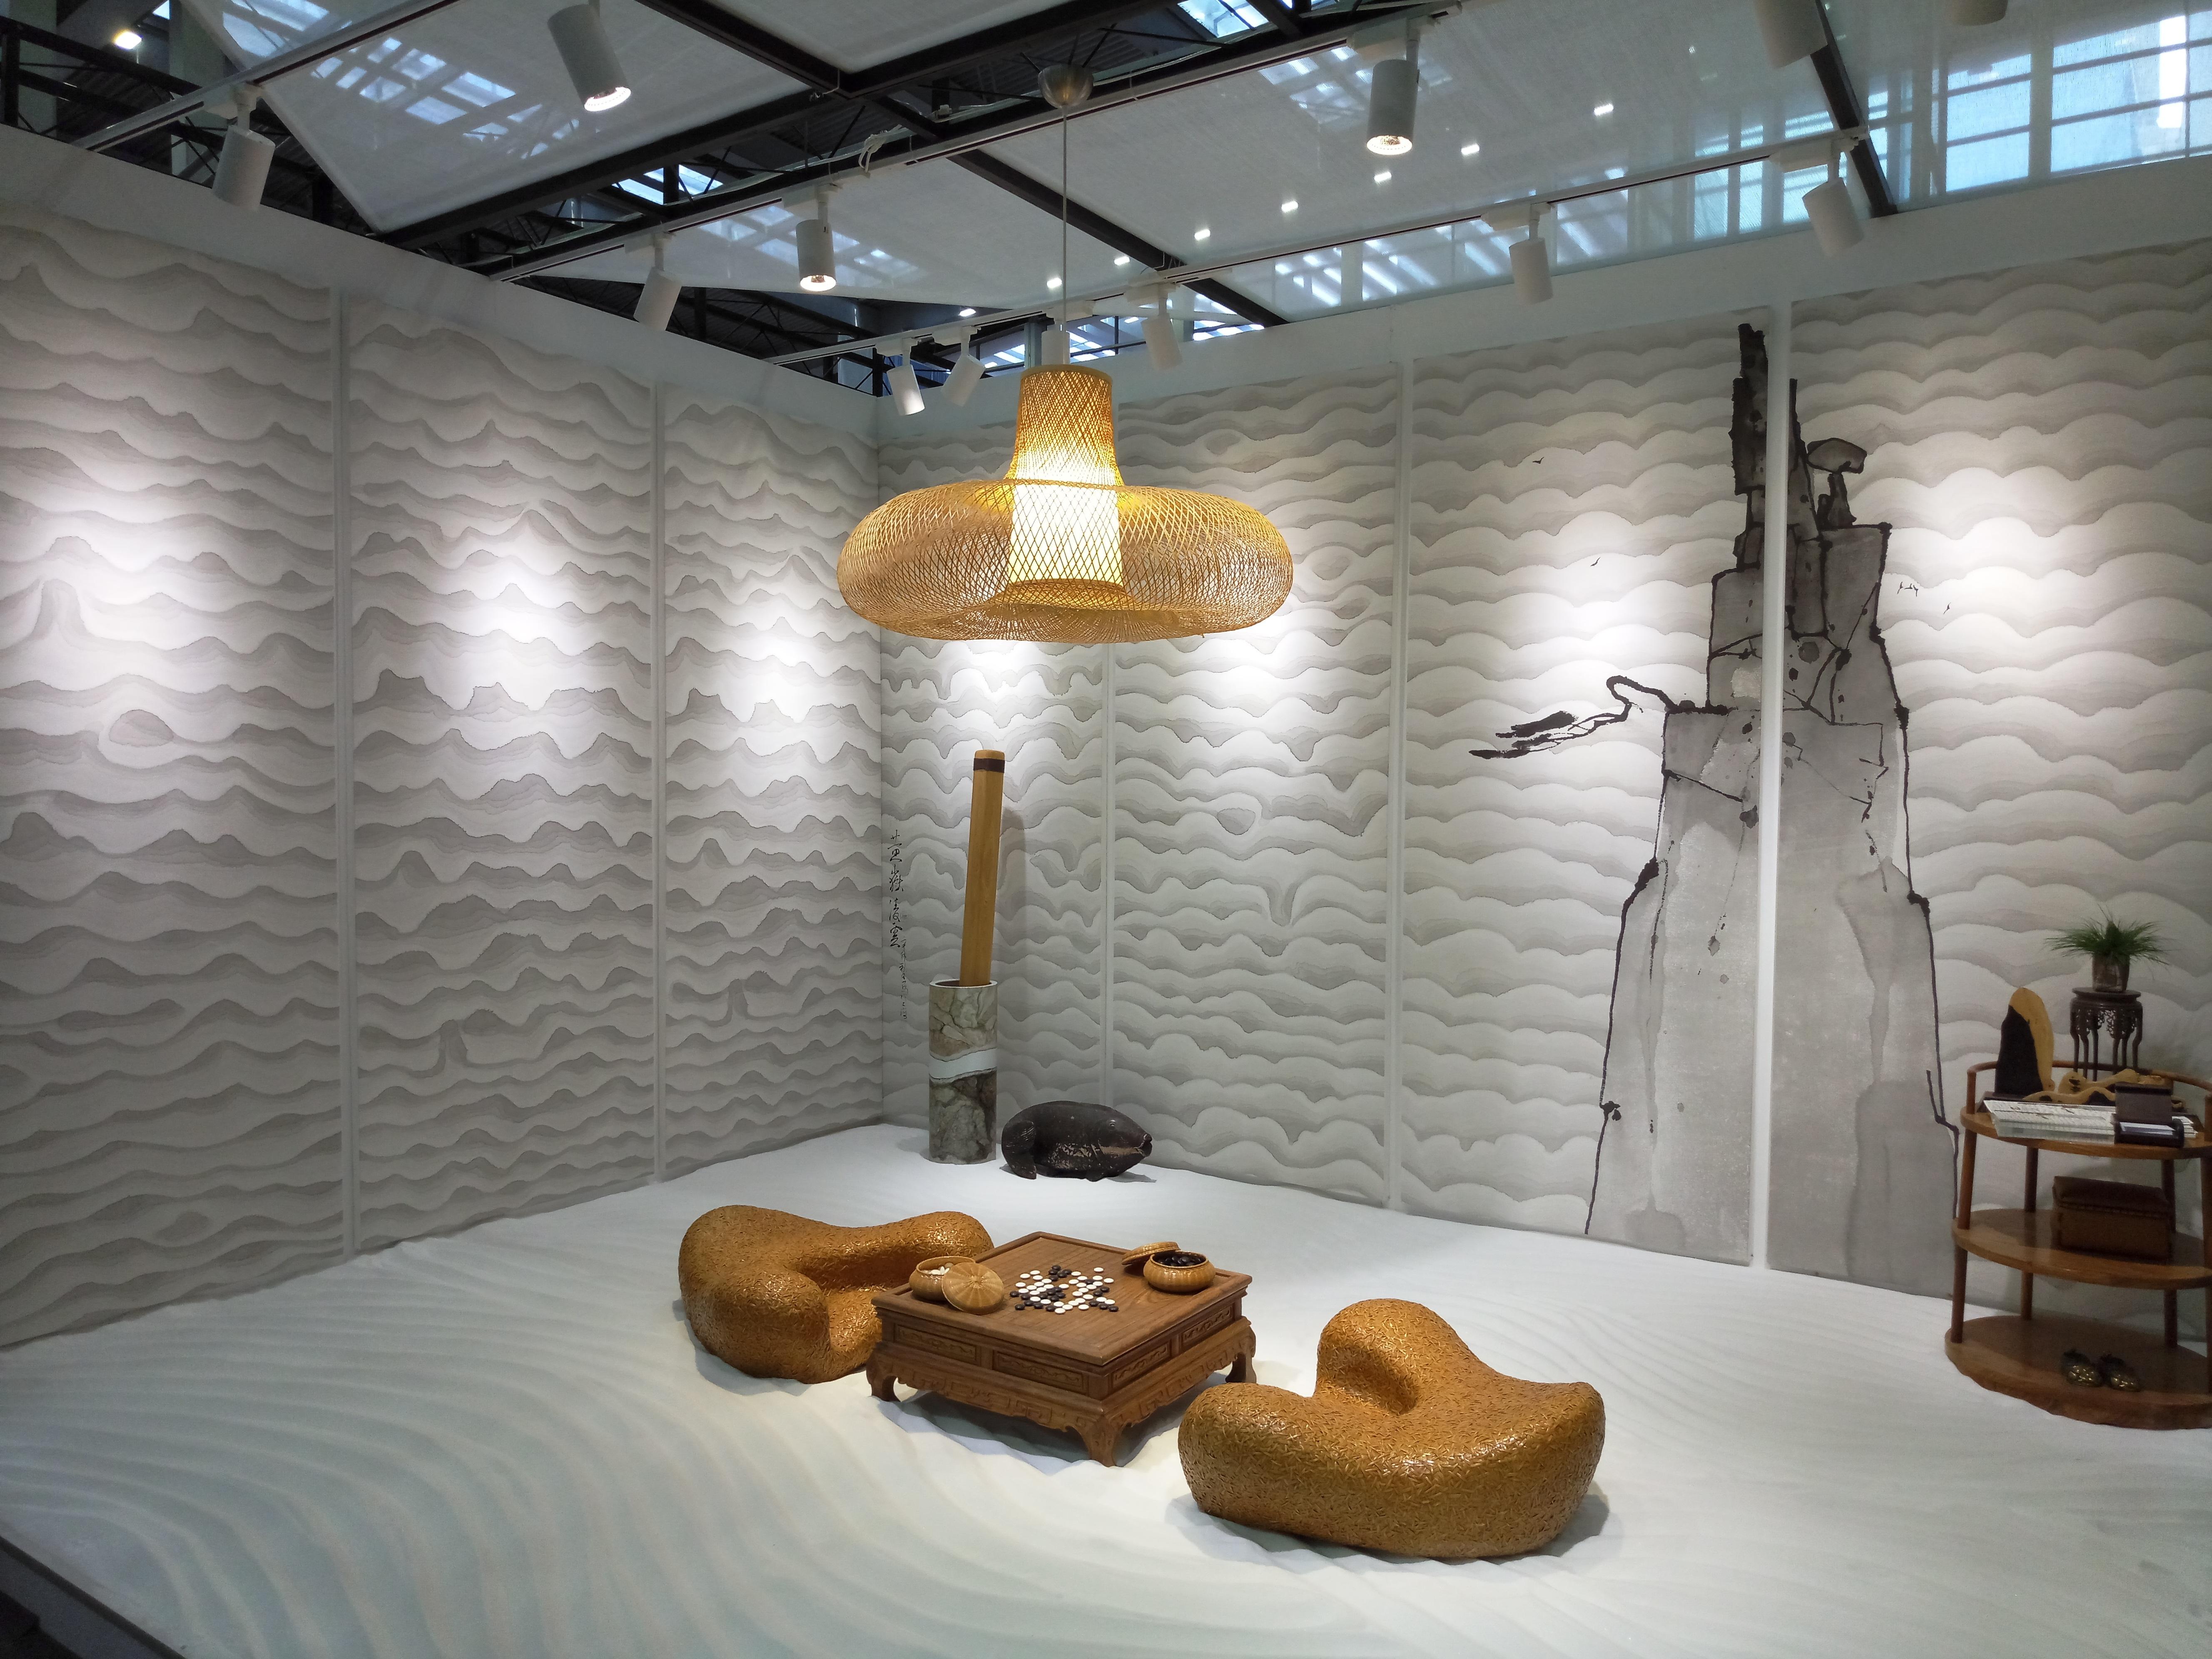 Floor Room Interior Design Home Improvement Effect Picture Design Tourist  Attraction